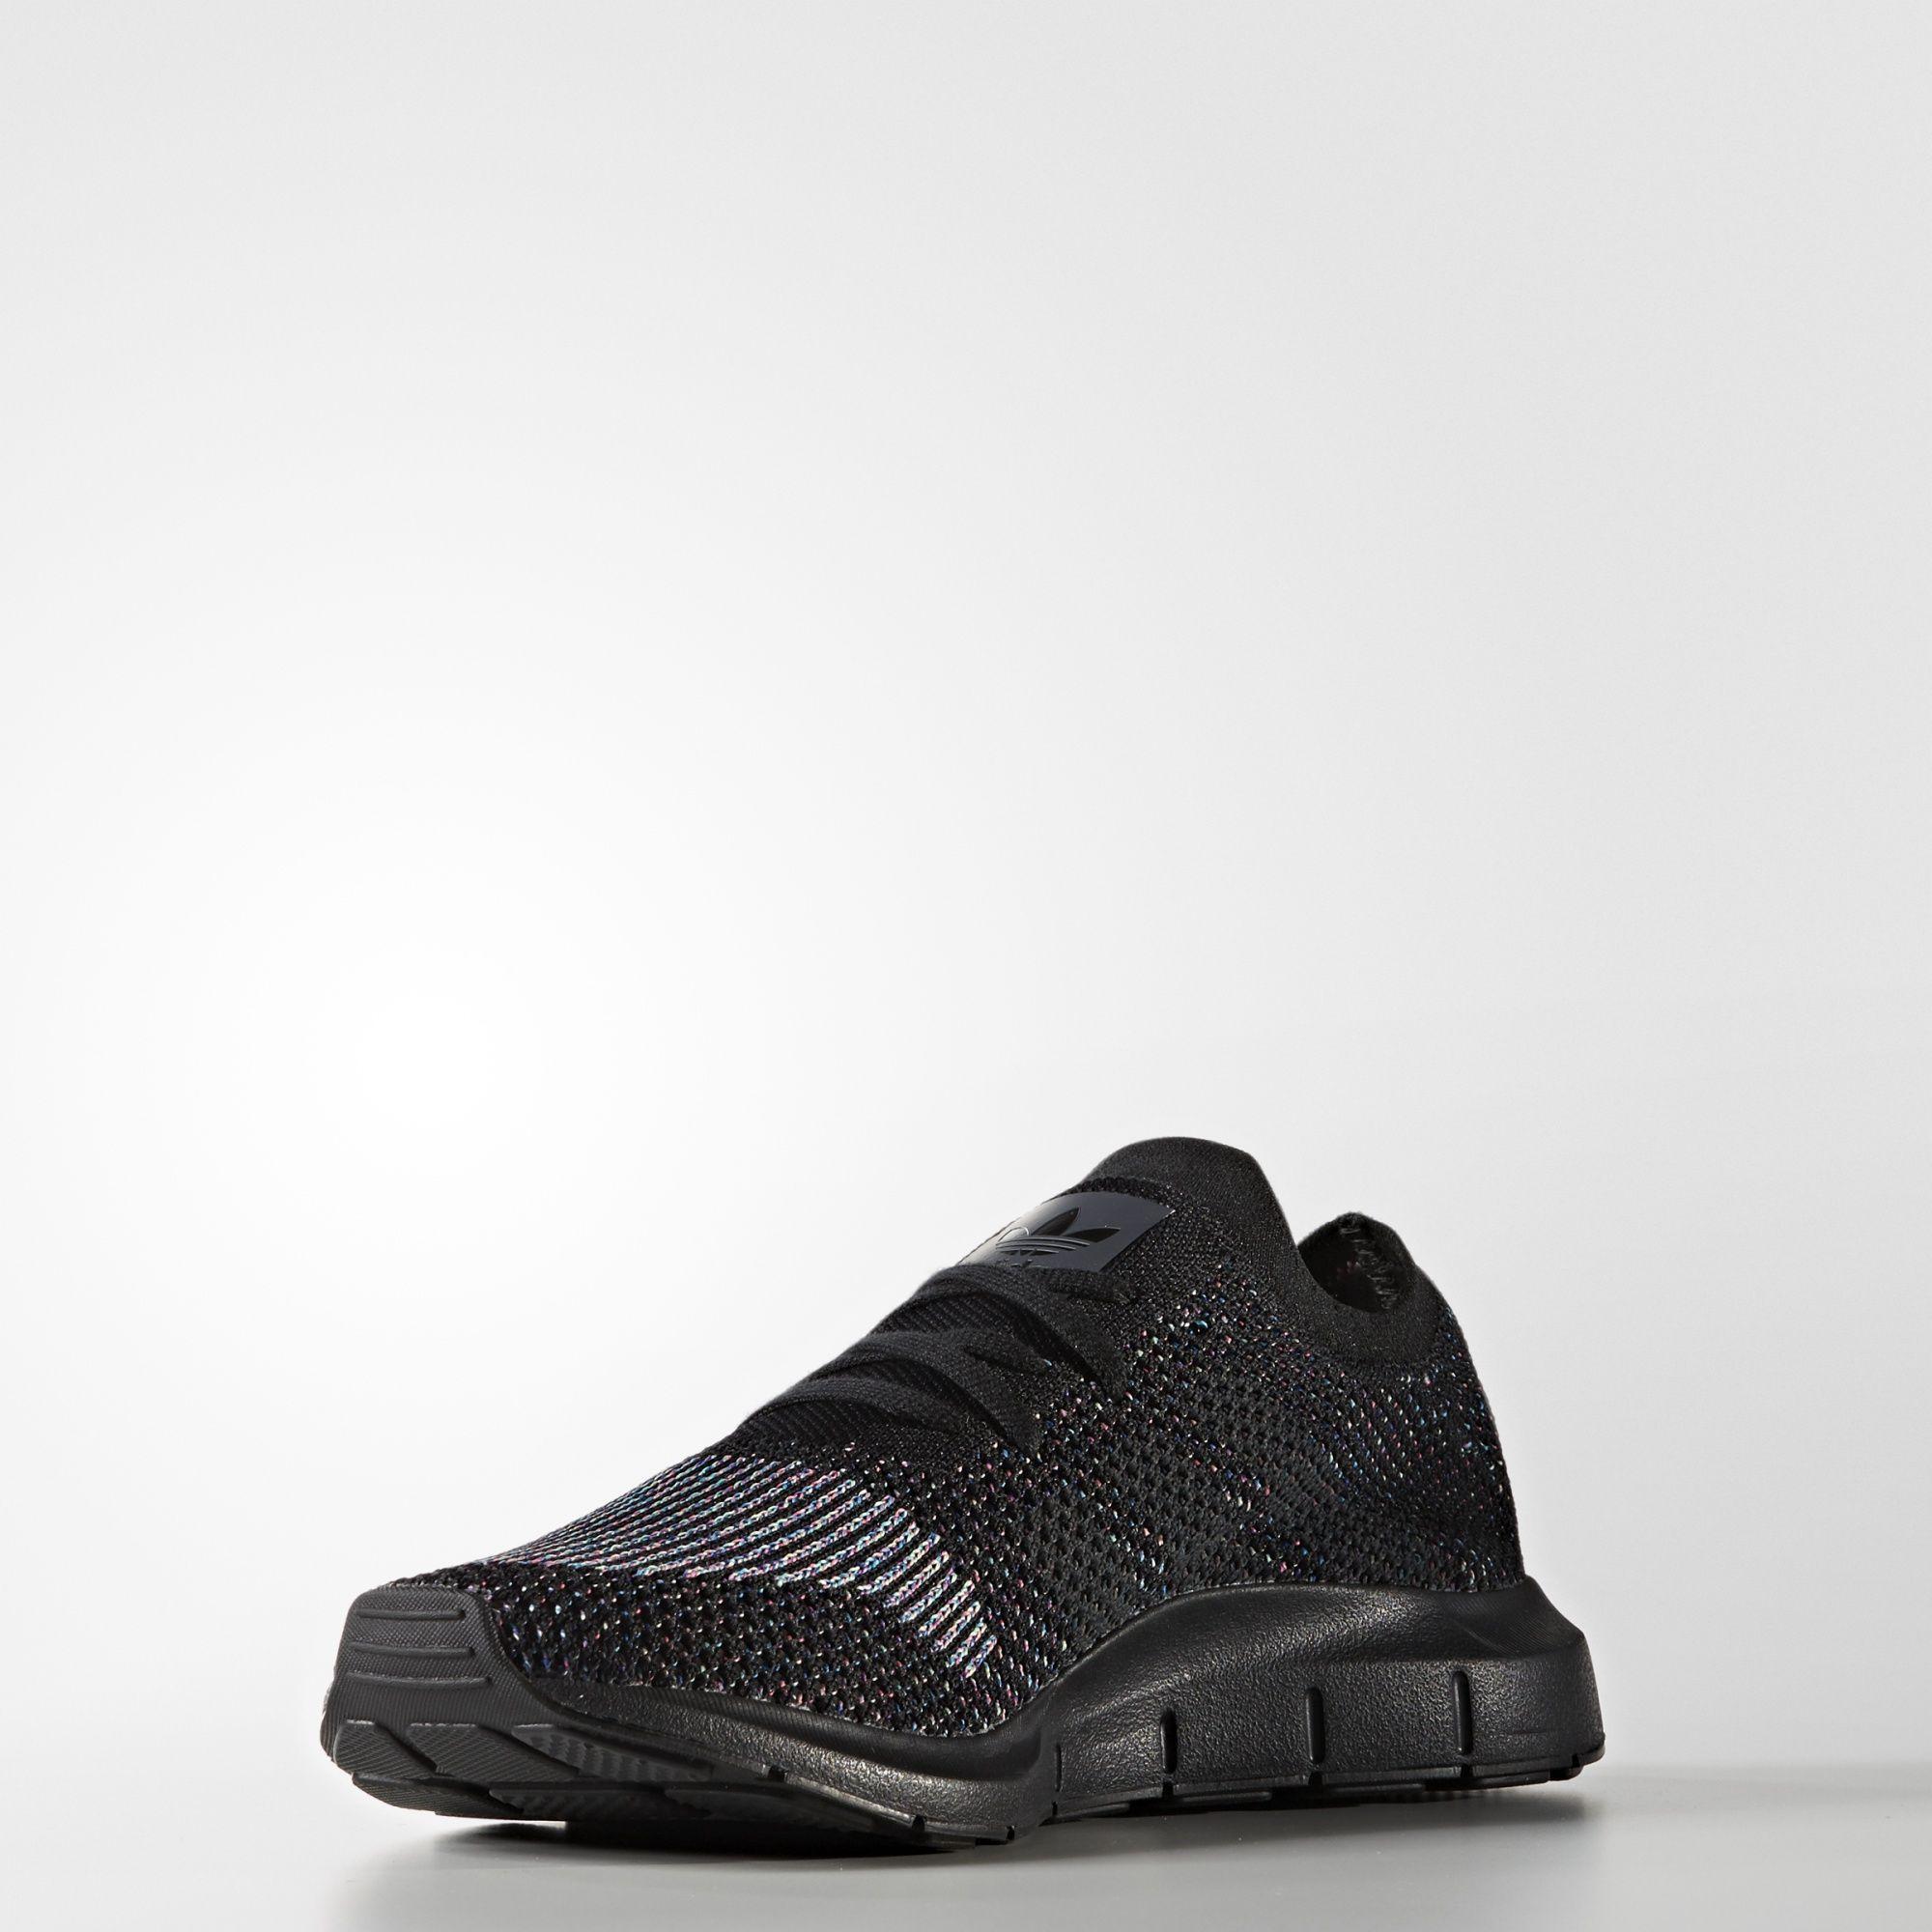 CG4127 adidas Swift Run Primeknit Black 2